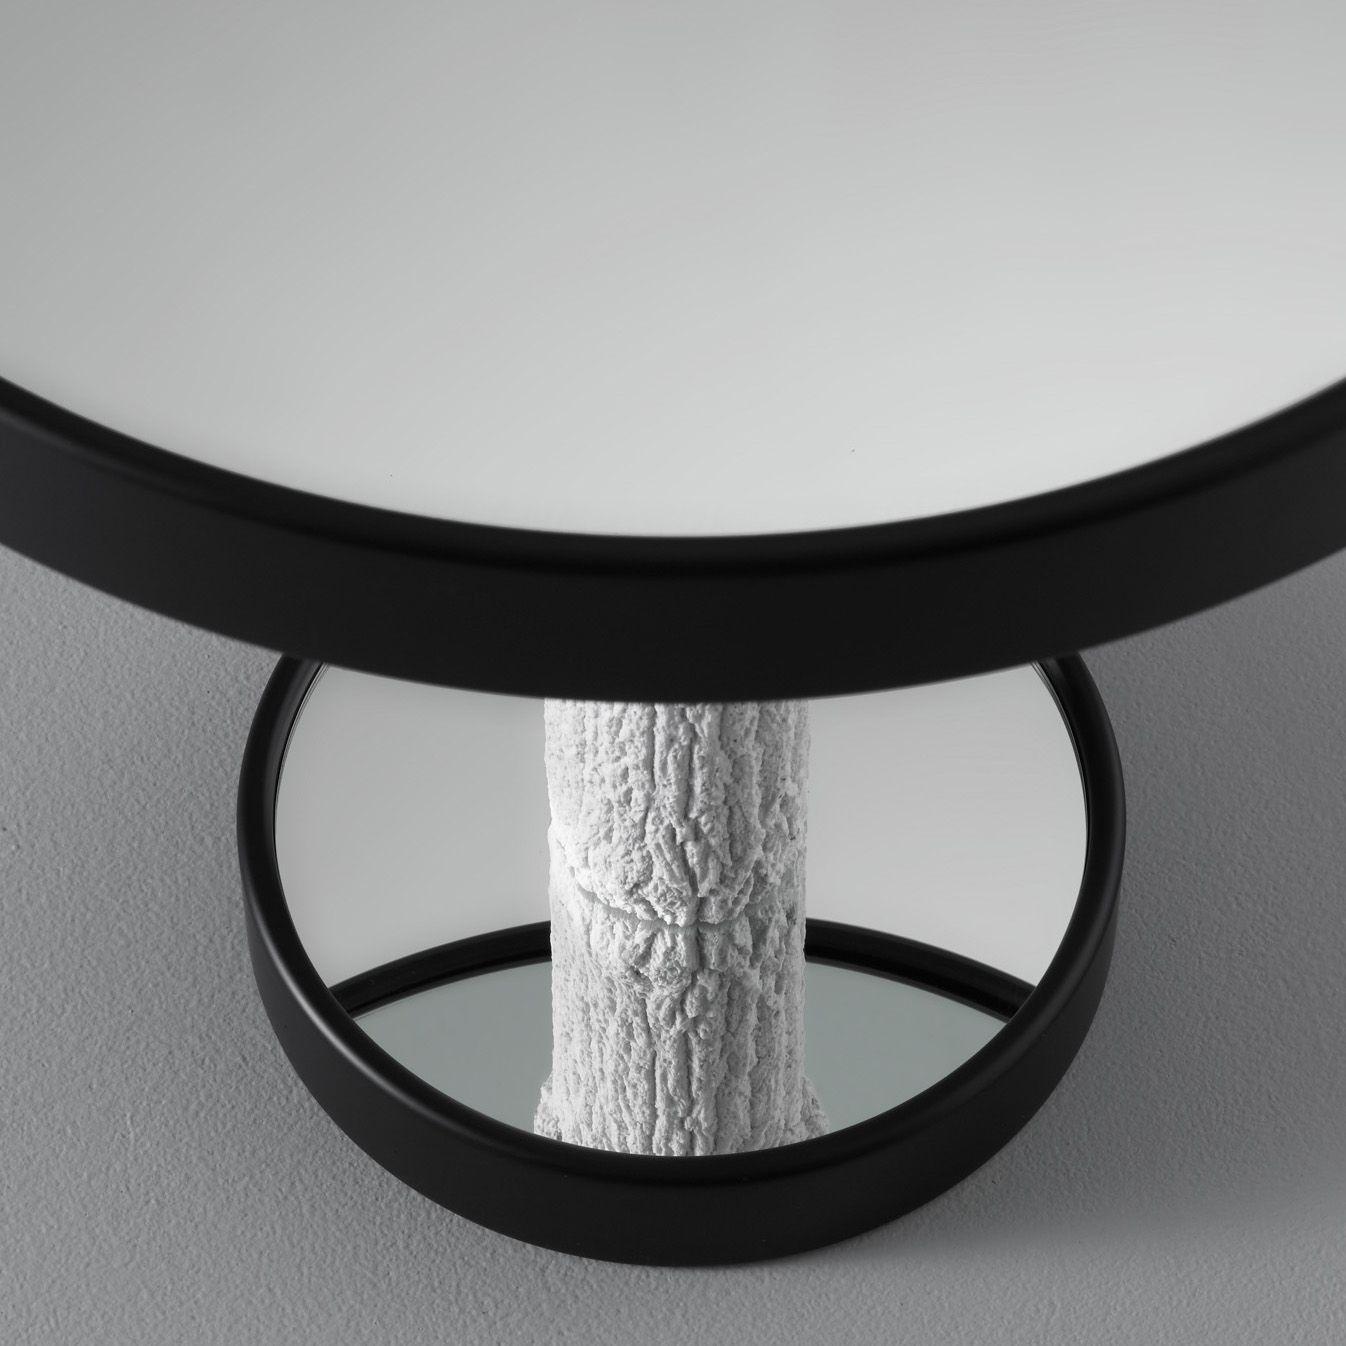 Pietro Chiesa - 1937 https://houseoluv.com/en/catalog/corteccia-side-table-p-29146/